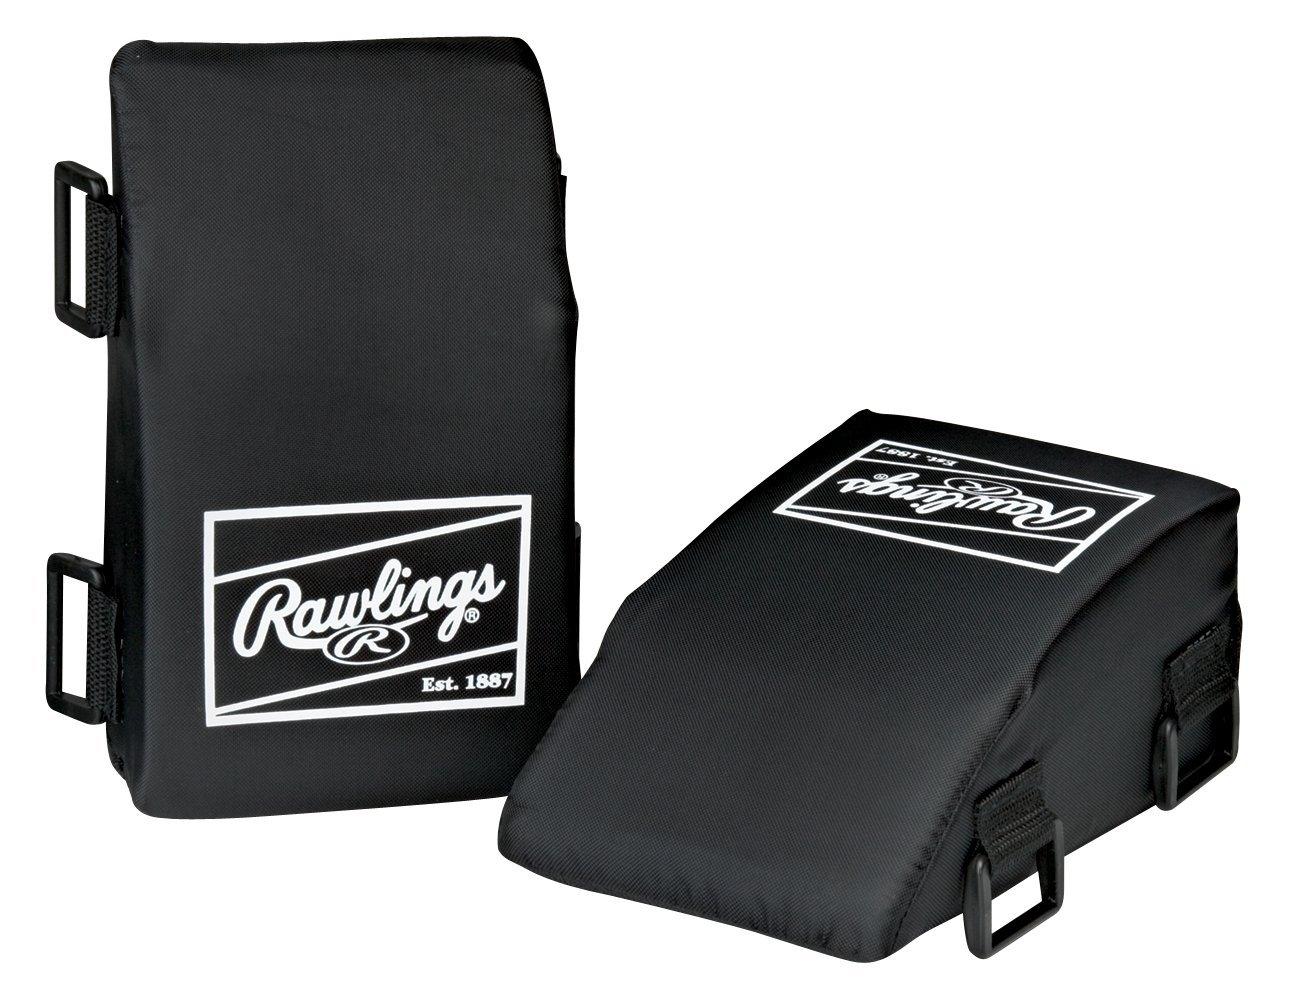 Rawlings RKR Catchers Knee Reliever RKR-Y